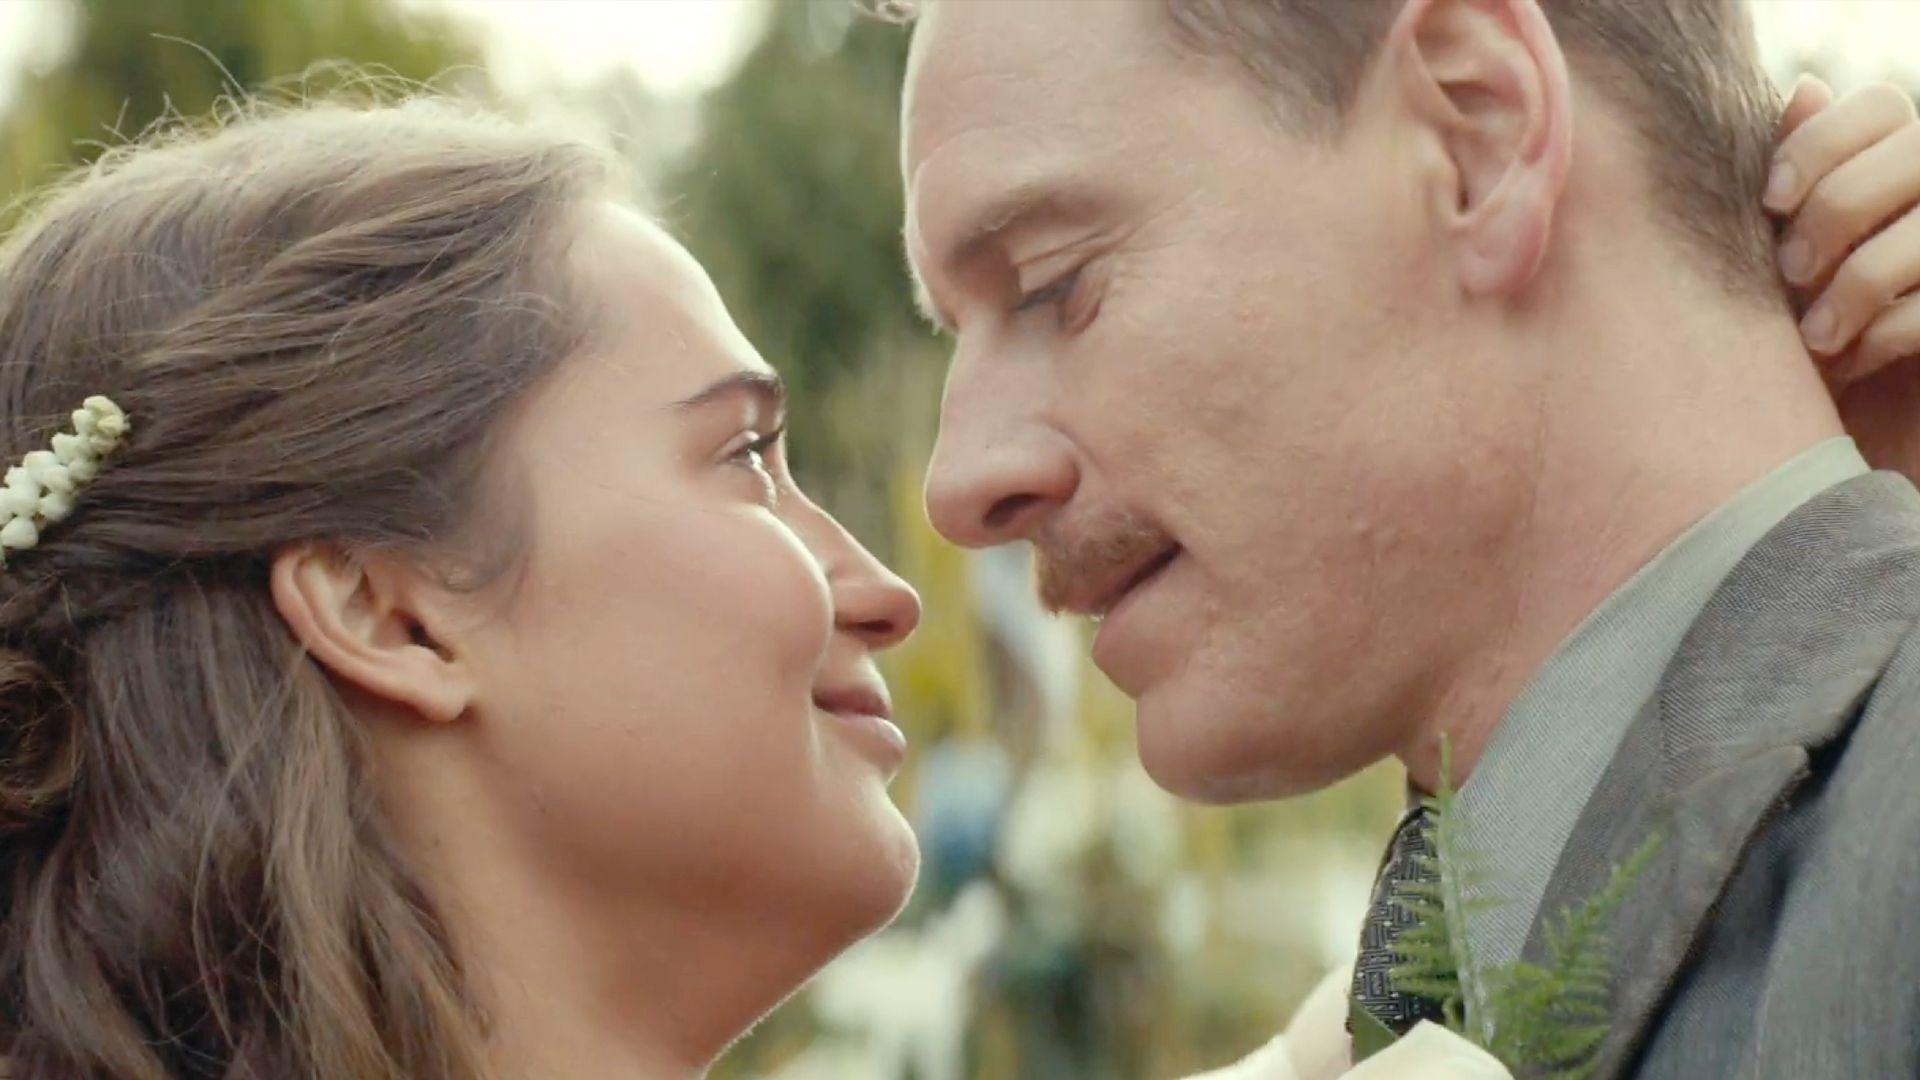 The Light Between Oceans Movie Info Movie Times Trailers Reviews Tickets The Light Between Oceans Michael Fassbender Love Movie Trailer